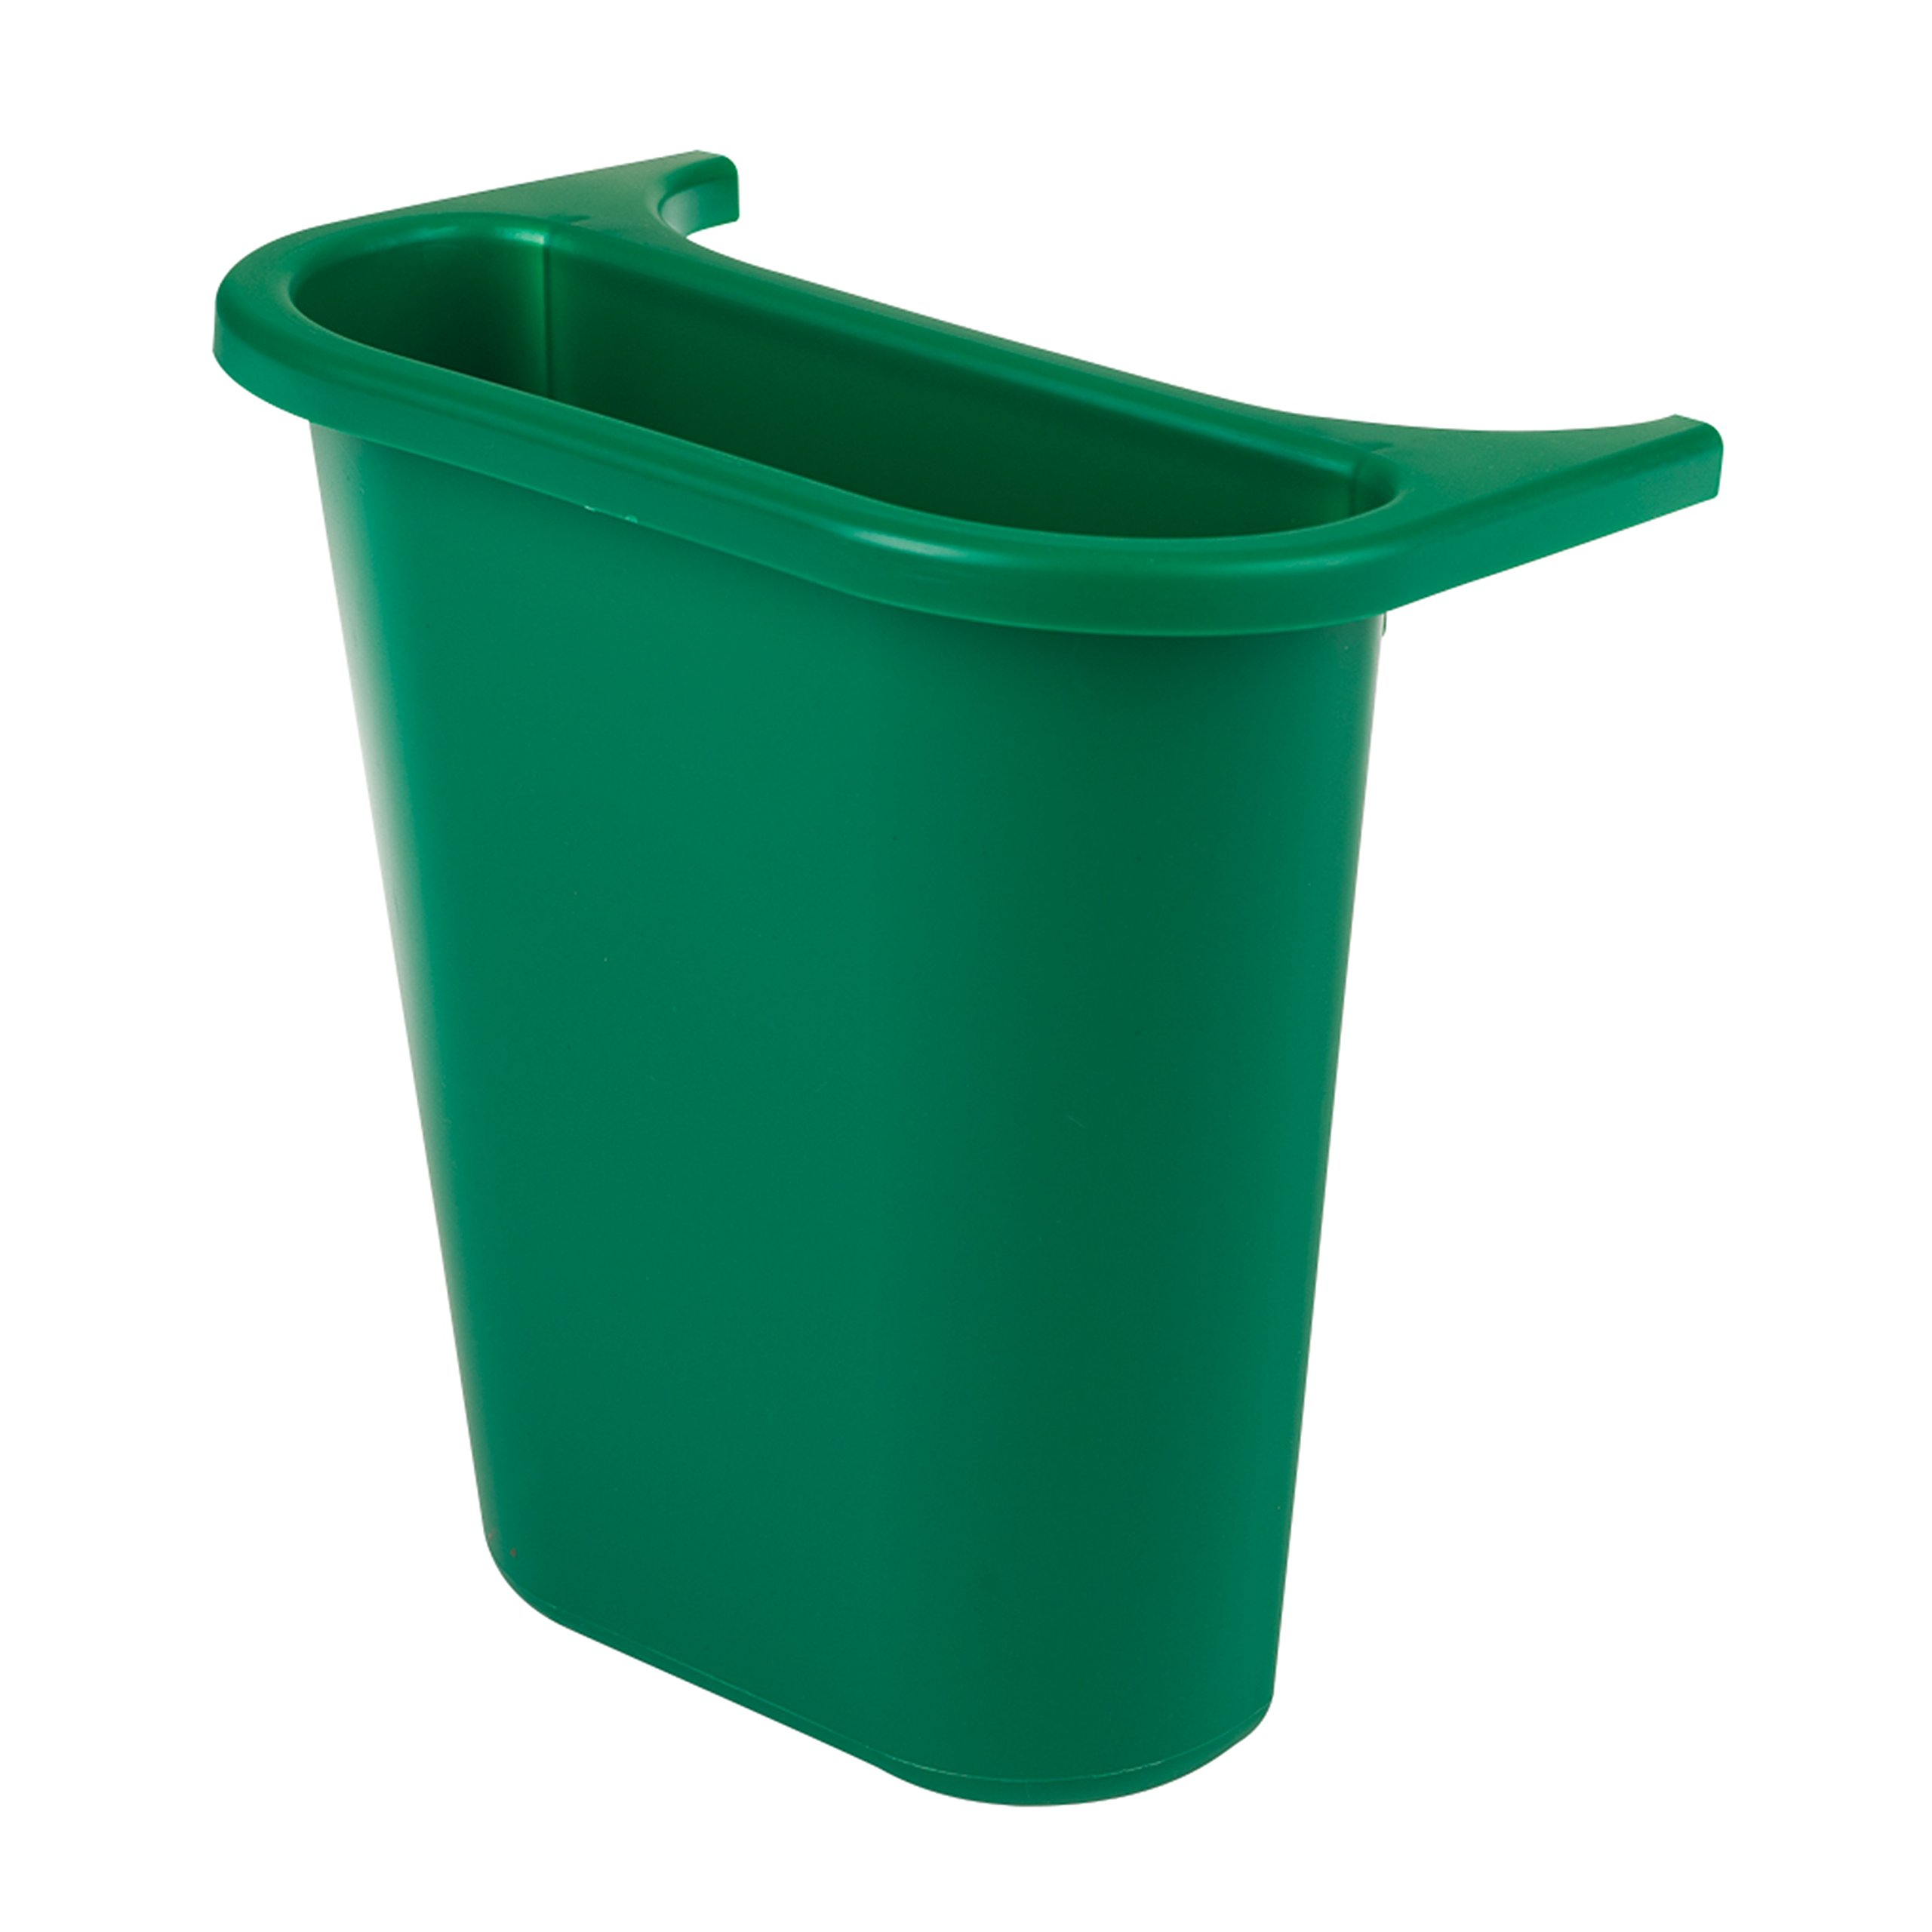 Cheap Trash Recycling Bin, find Trash Recycling Bin deals on line at ...